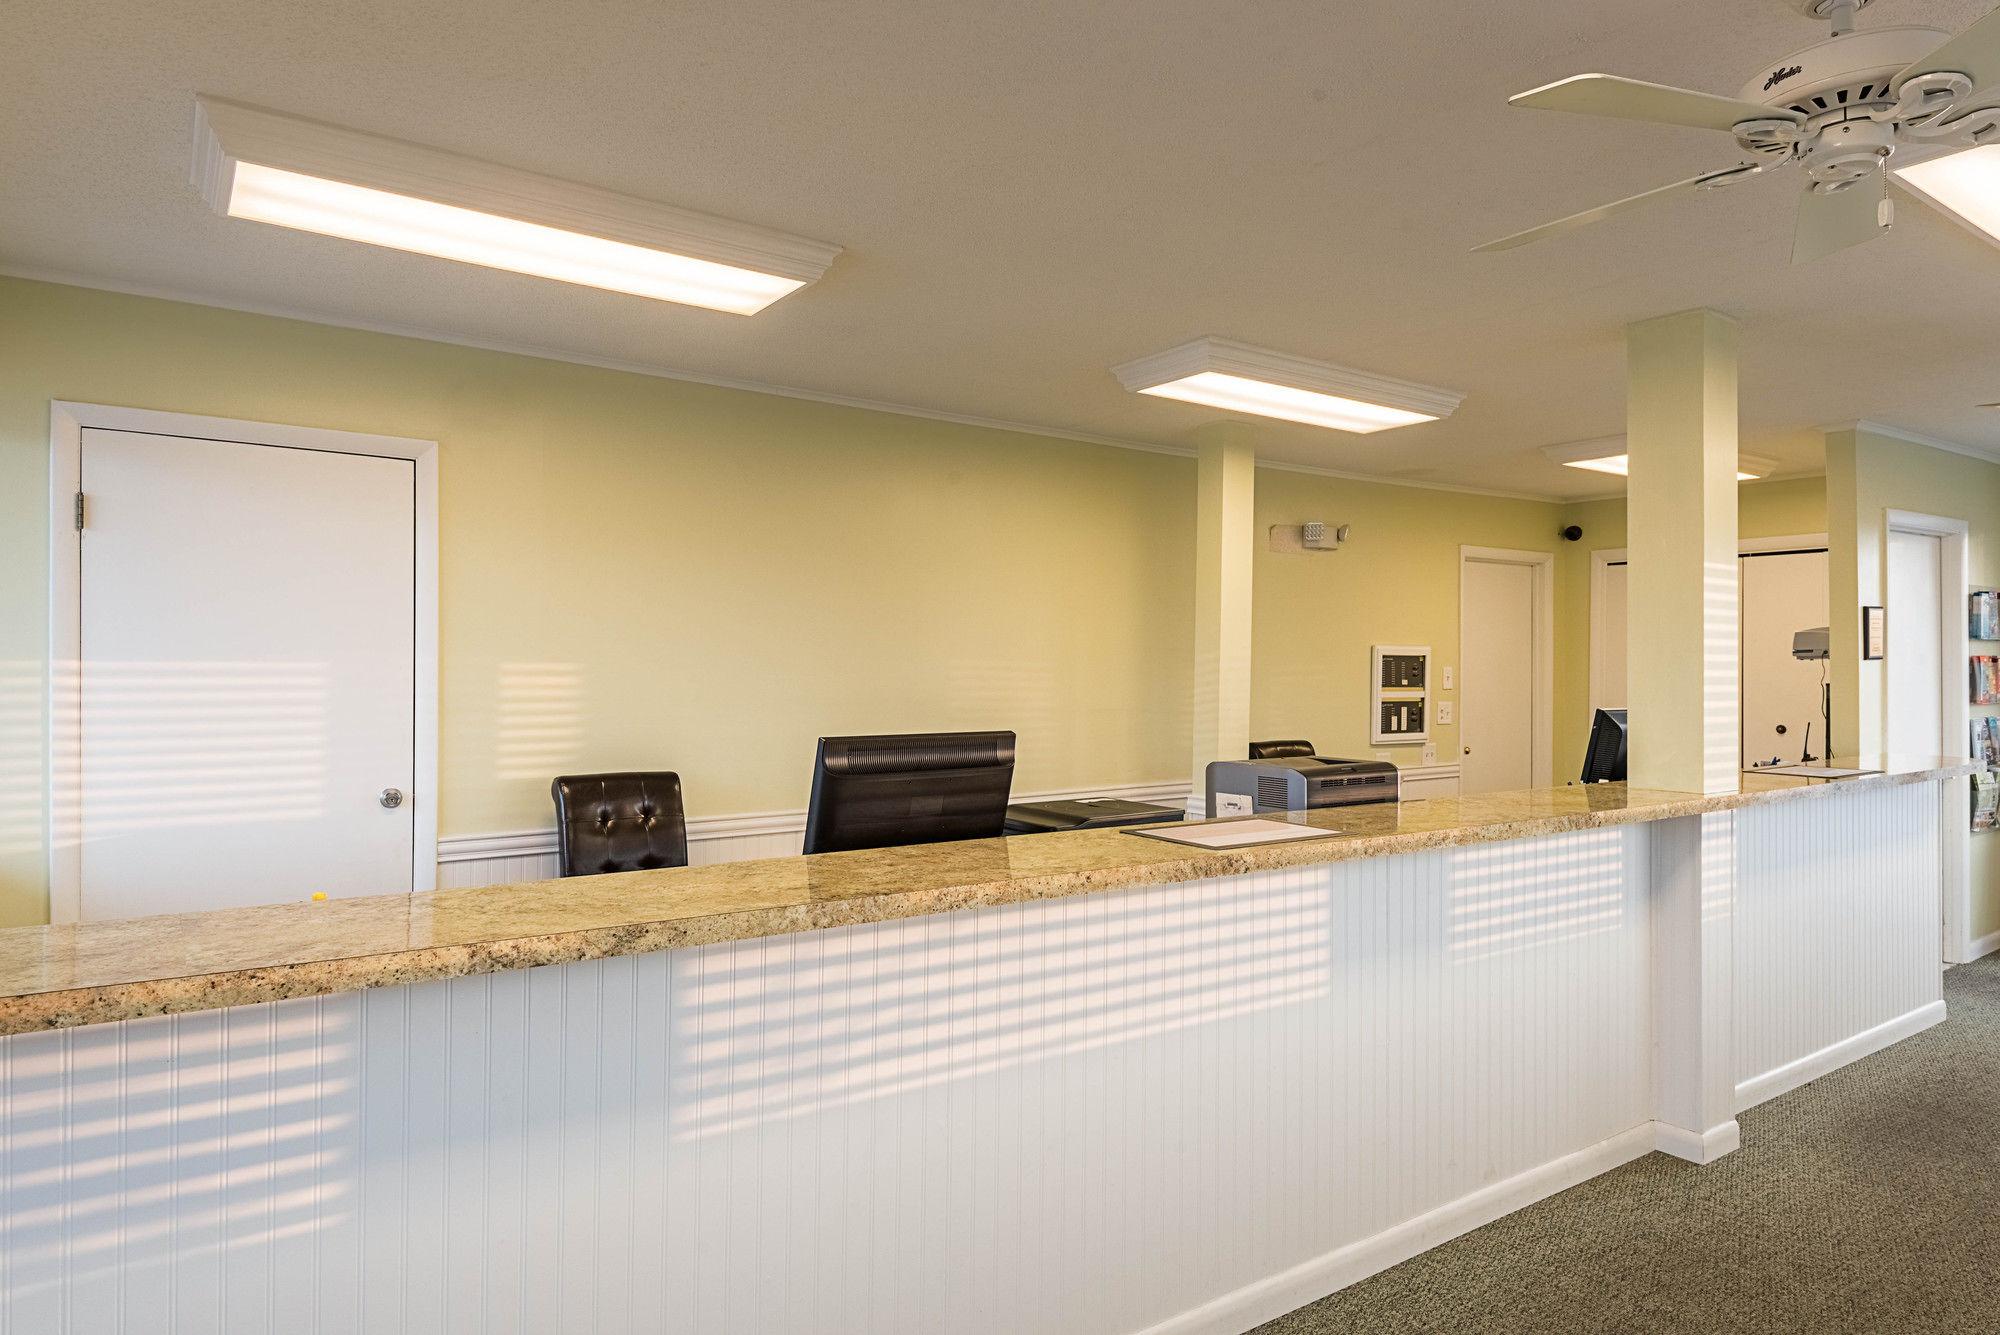 Rodeway Inn And Suites in Rehoboth Beach, DE